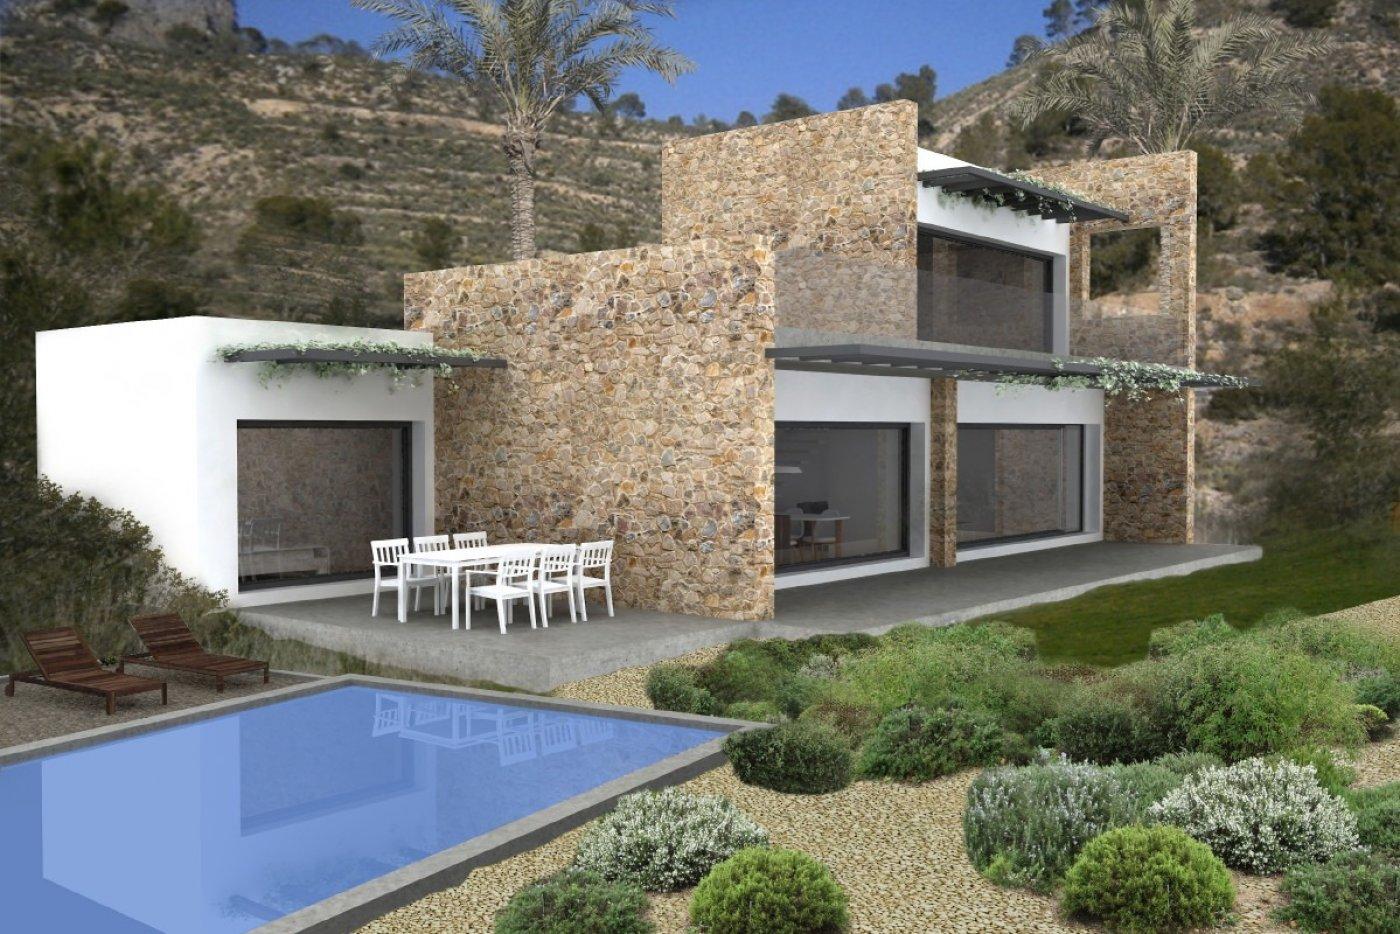 Country House in Finestrat La sima